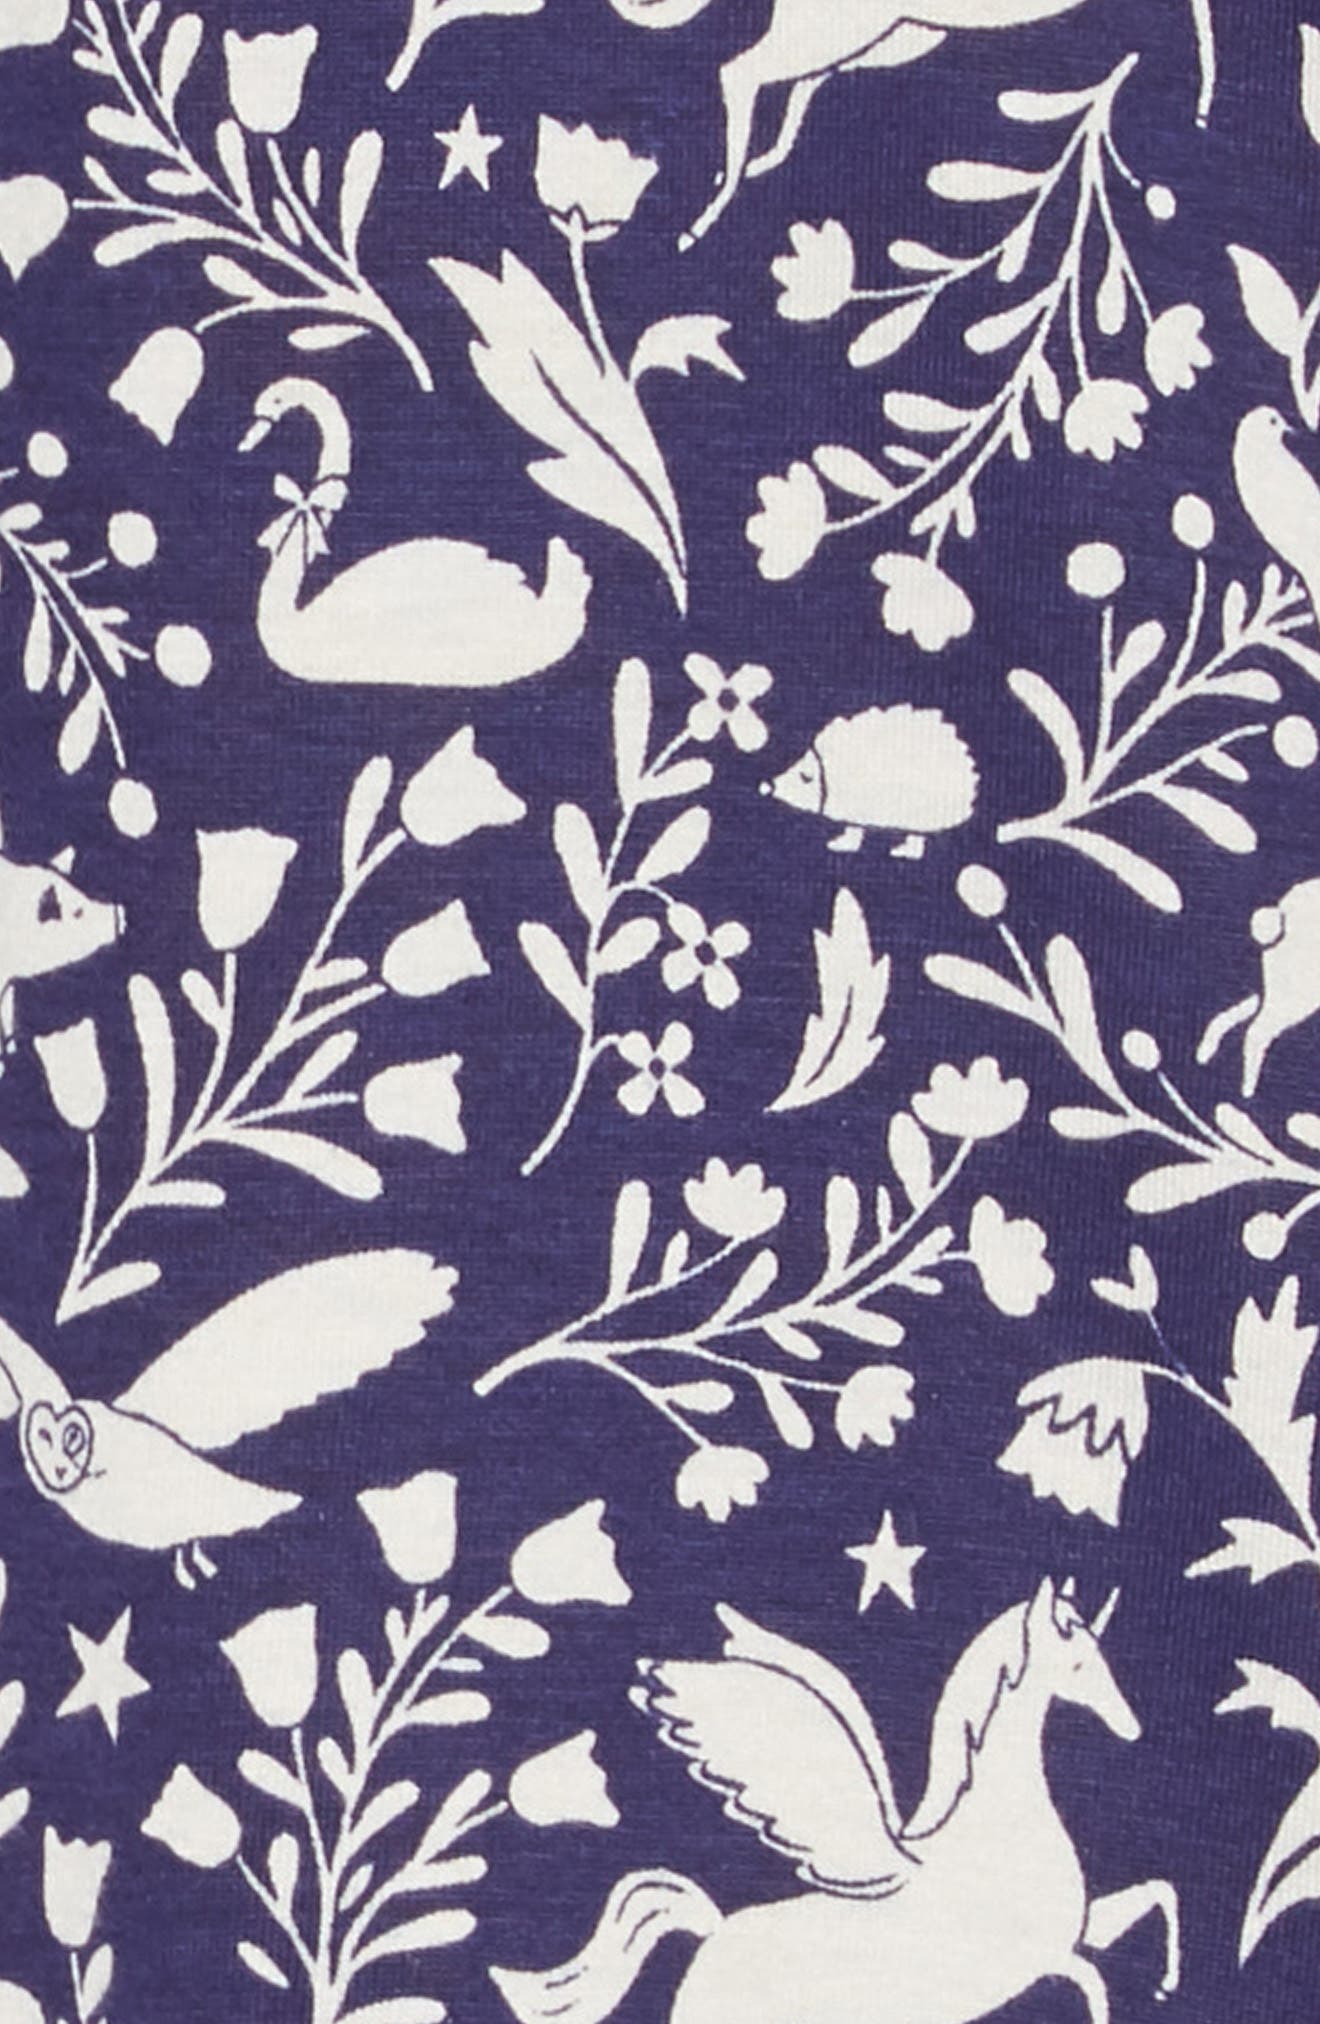 Print Jersey Dress,                             Alternate thumbnail 3, color,                             PRUSSIAN BLUE PECULIAR PETS